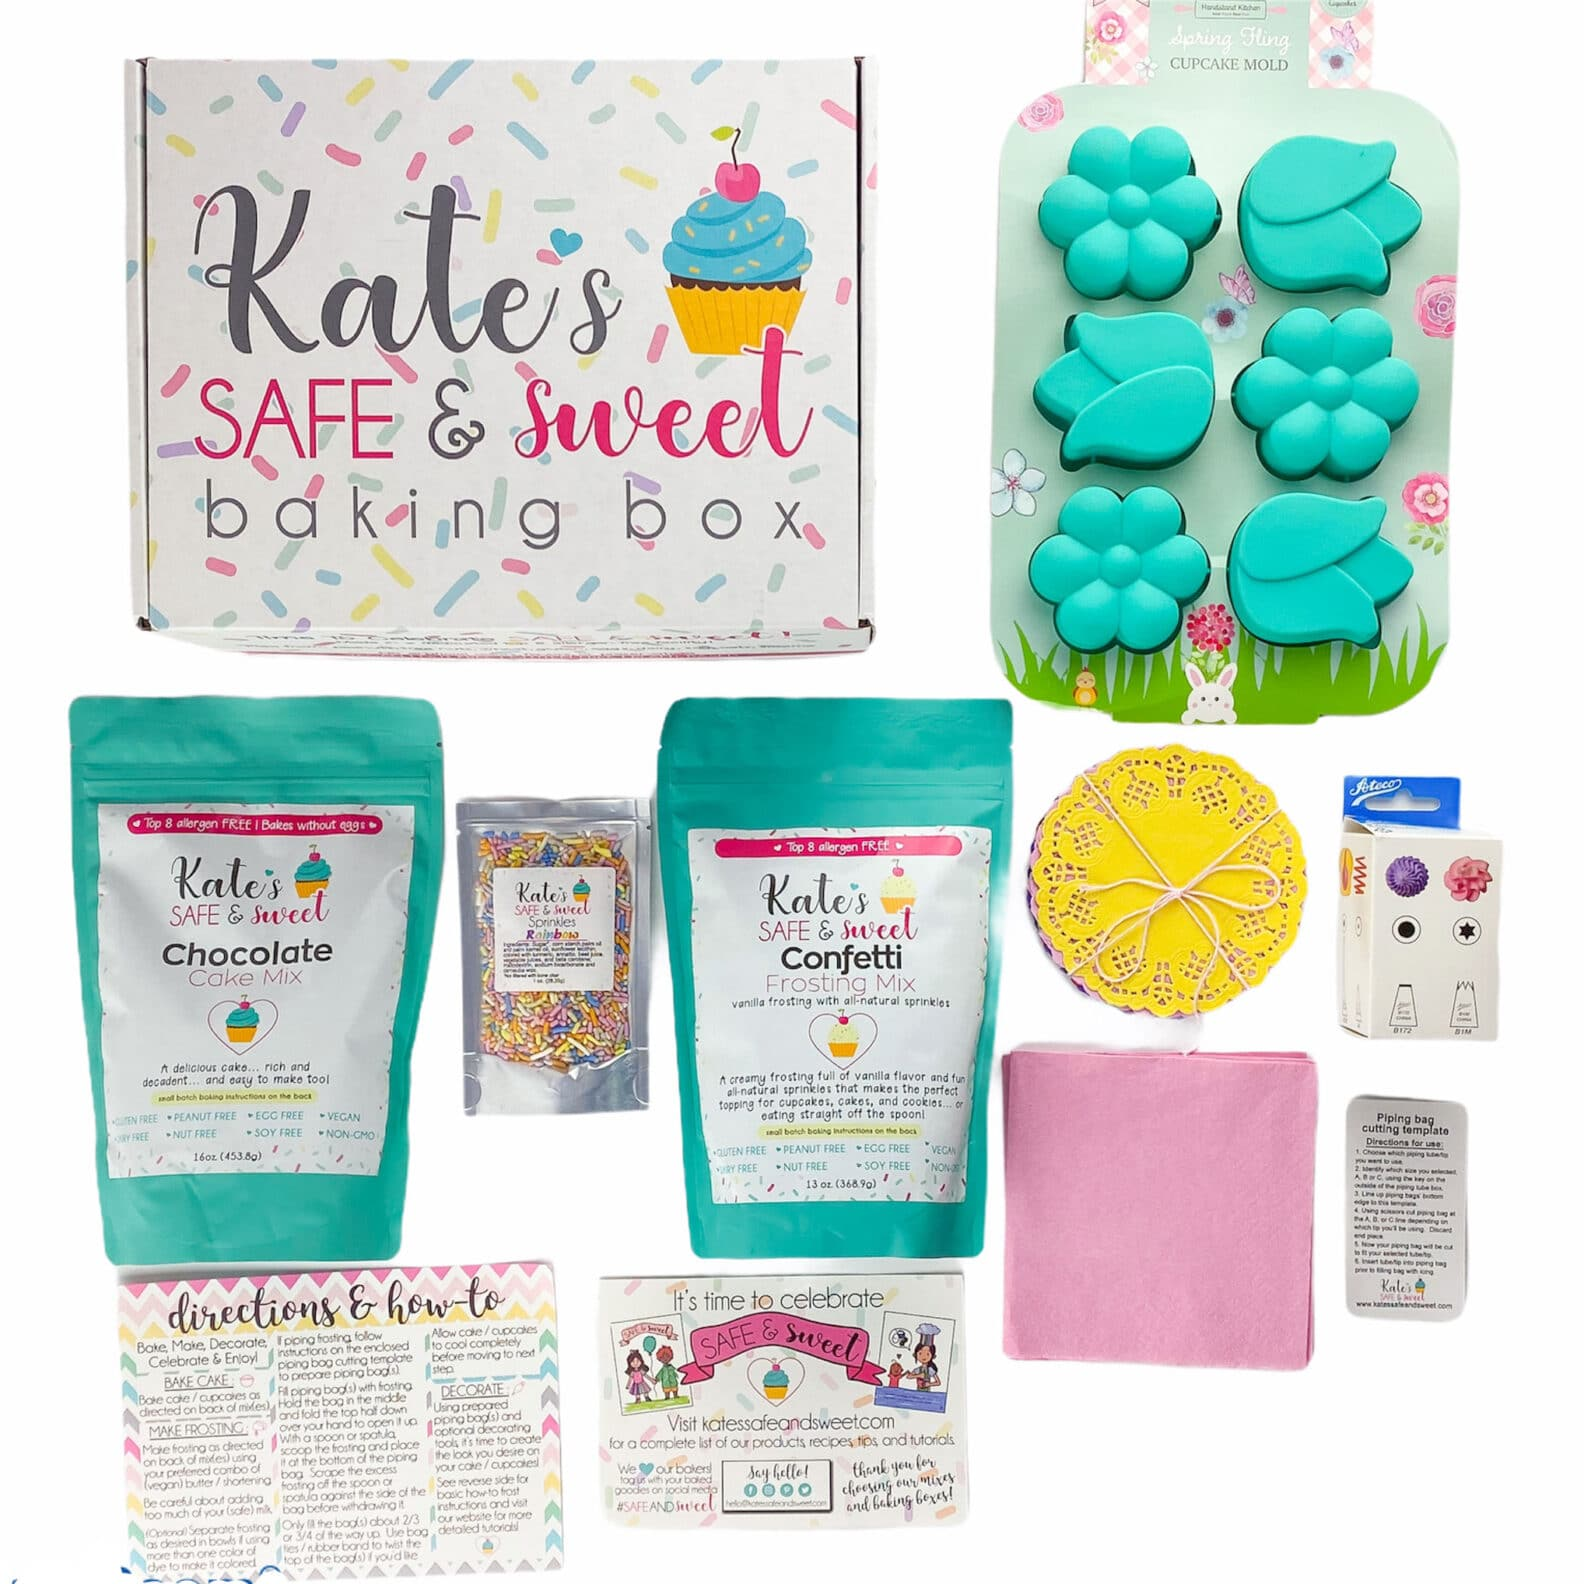 Kate's-Safe-and-Sweet---Spring-Fling-Flower-Baking-Box-Flatlay